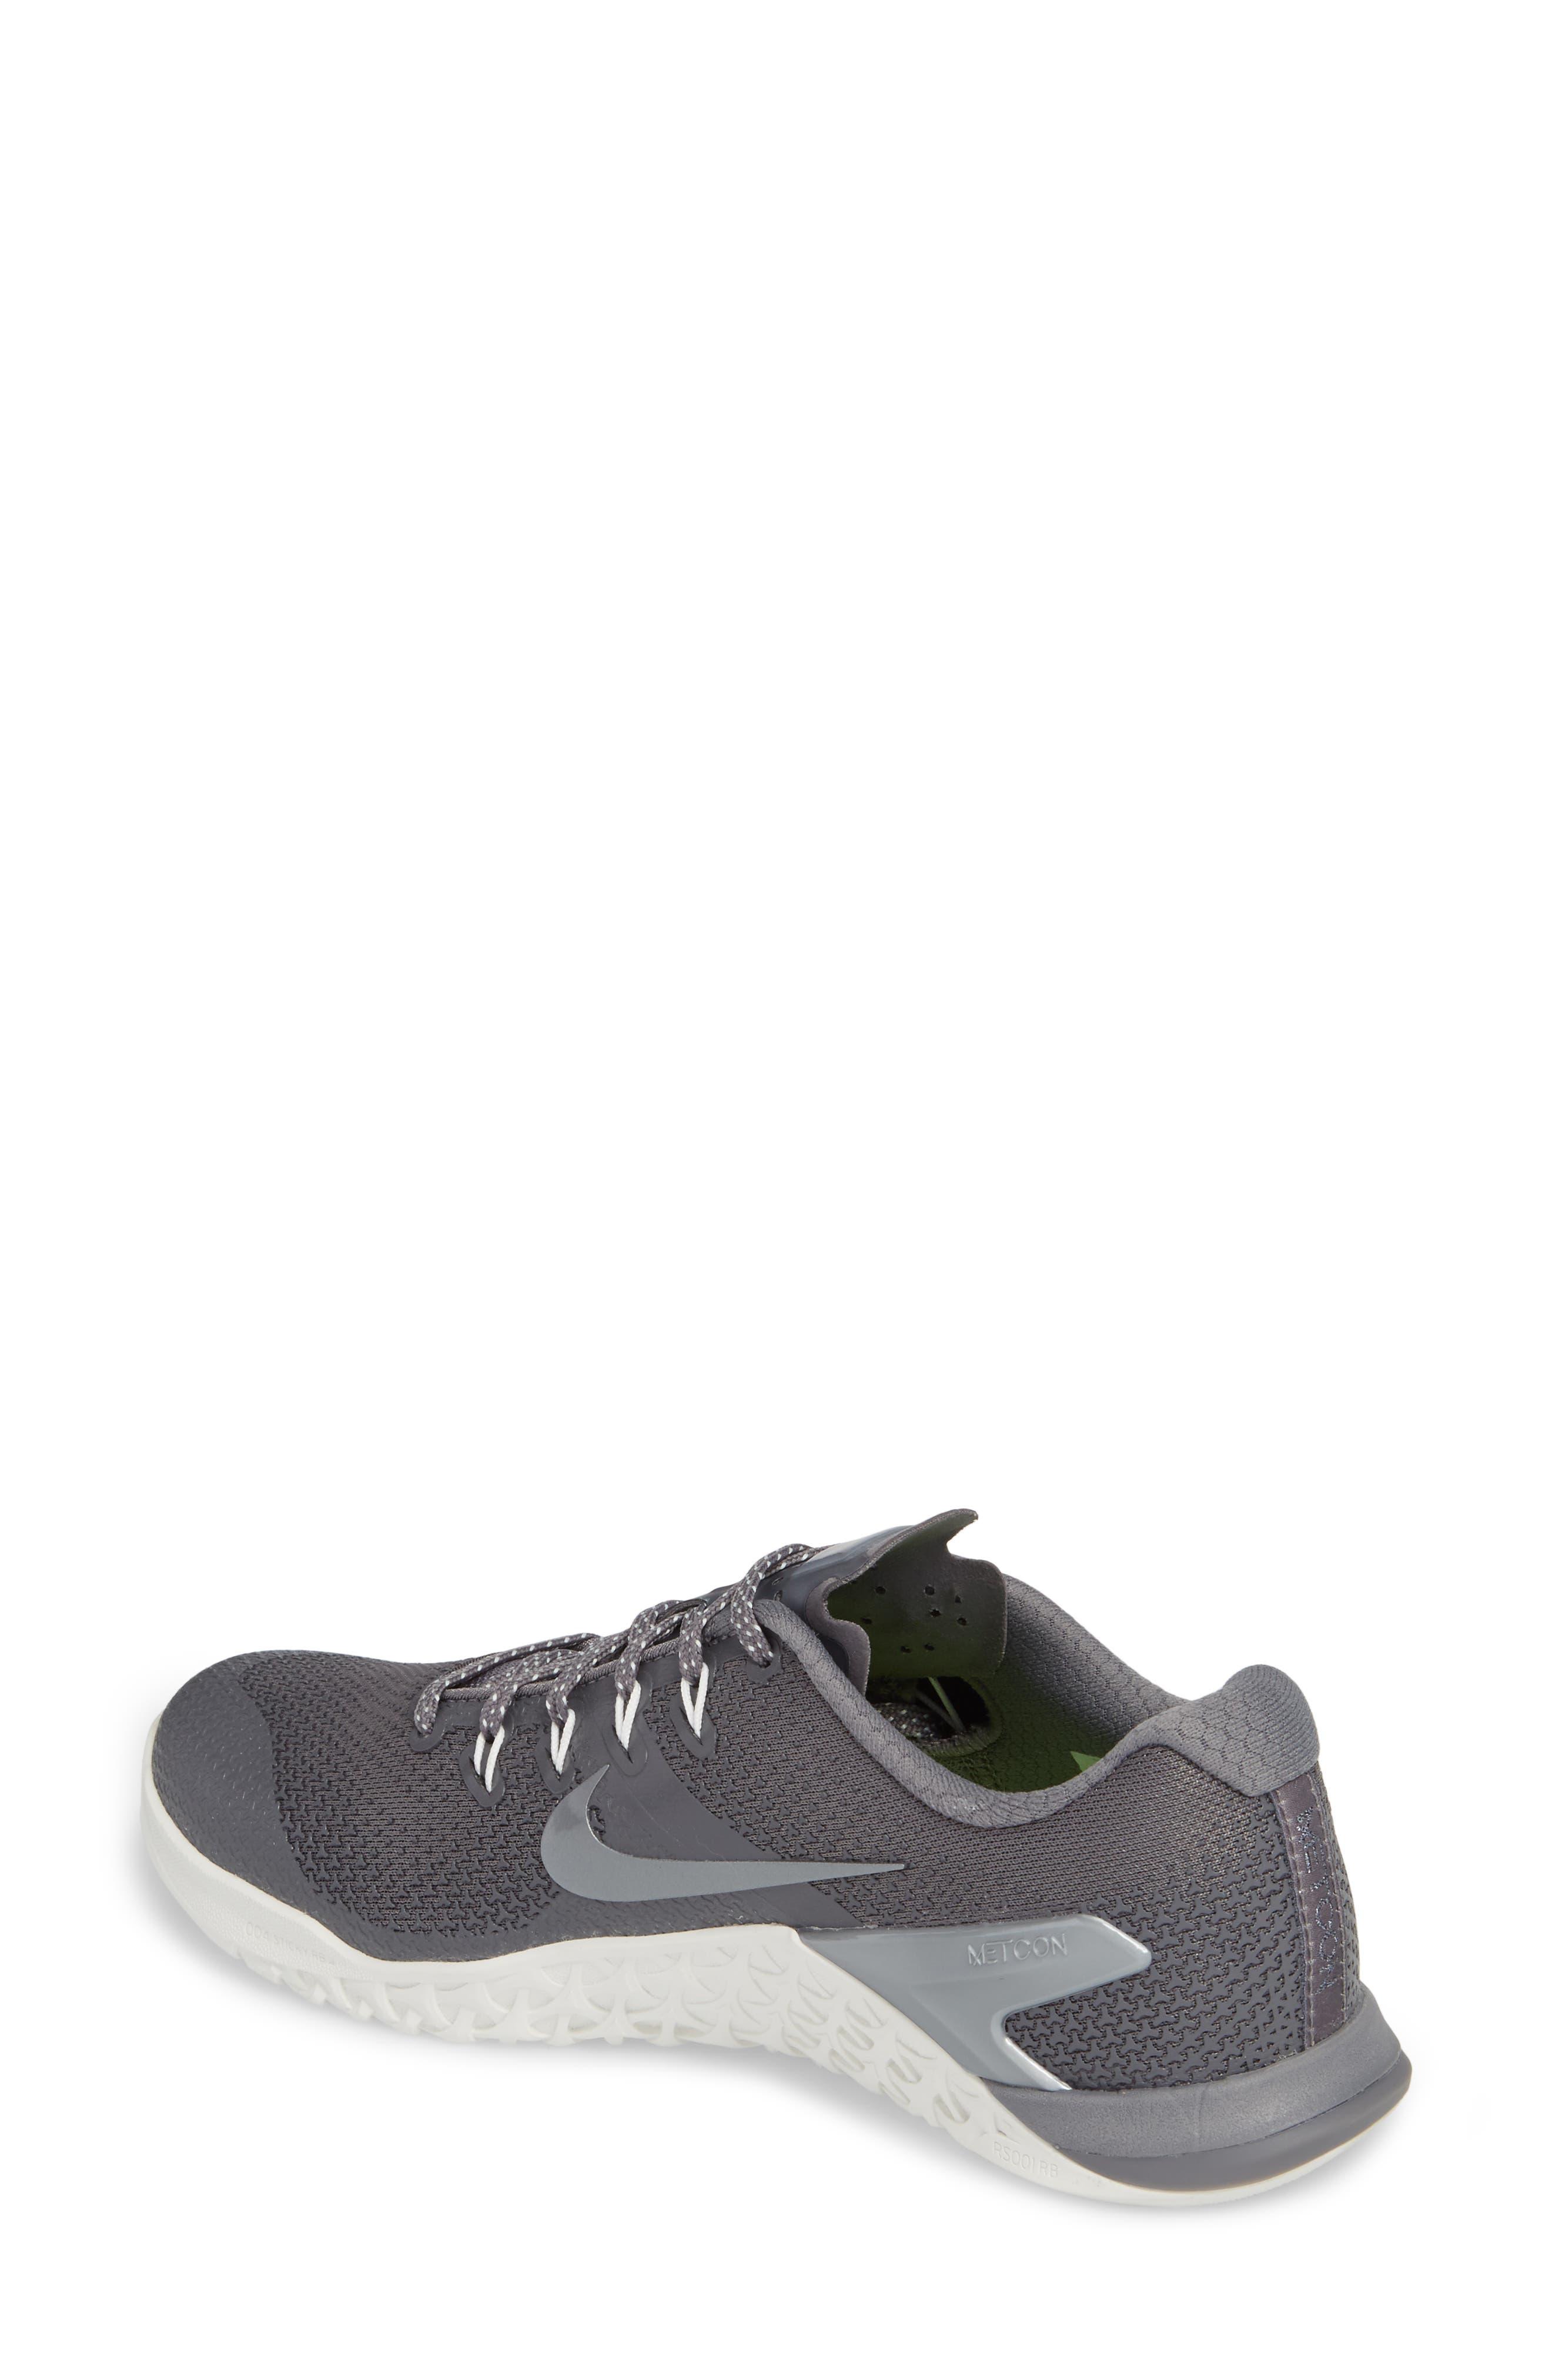 Metcon 4 Training Shoe,                             Alternate thumbnail 11, color,